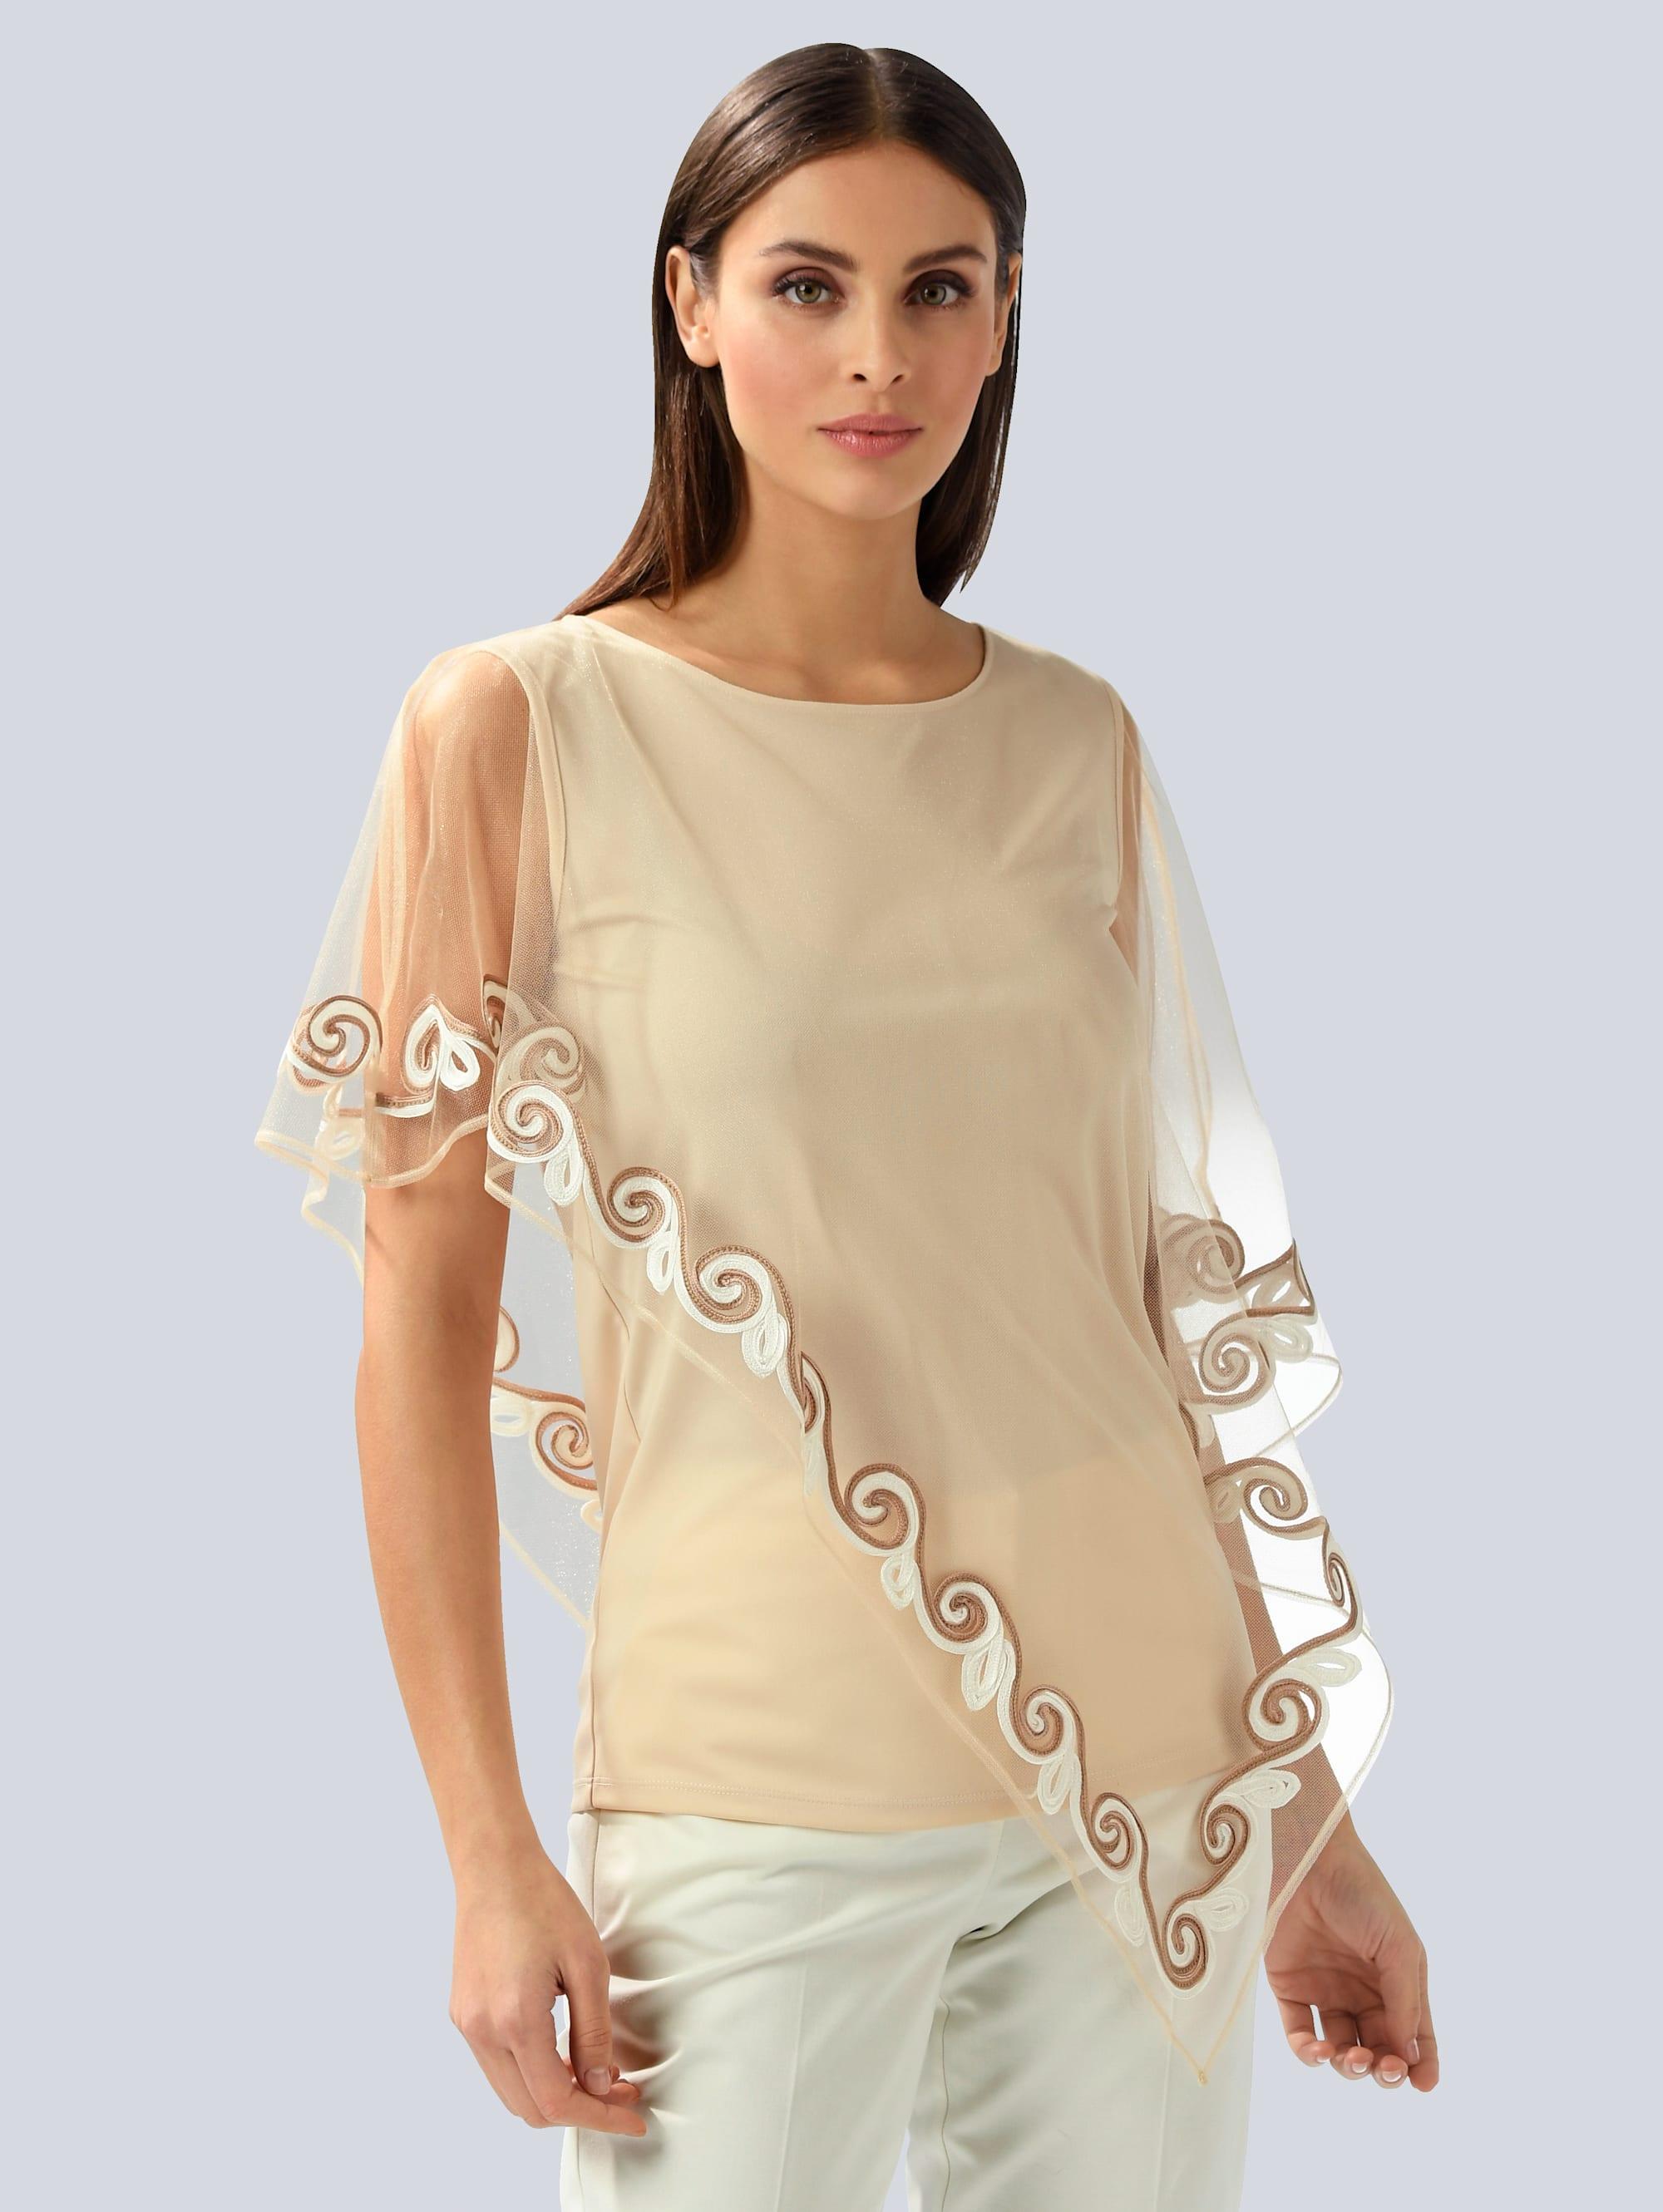 Alba Moda Spitzenbluse, mit Spitze beige Damen Spitzenbluse Spitzenblusen Blusen Tuniken